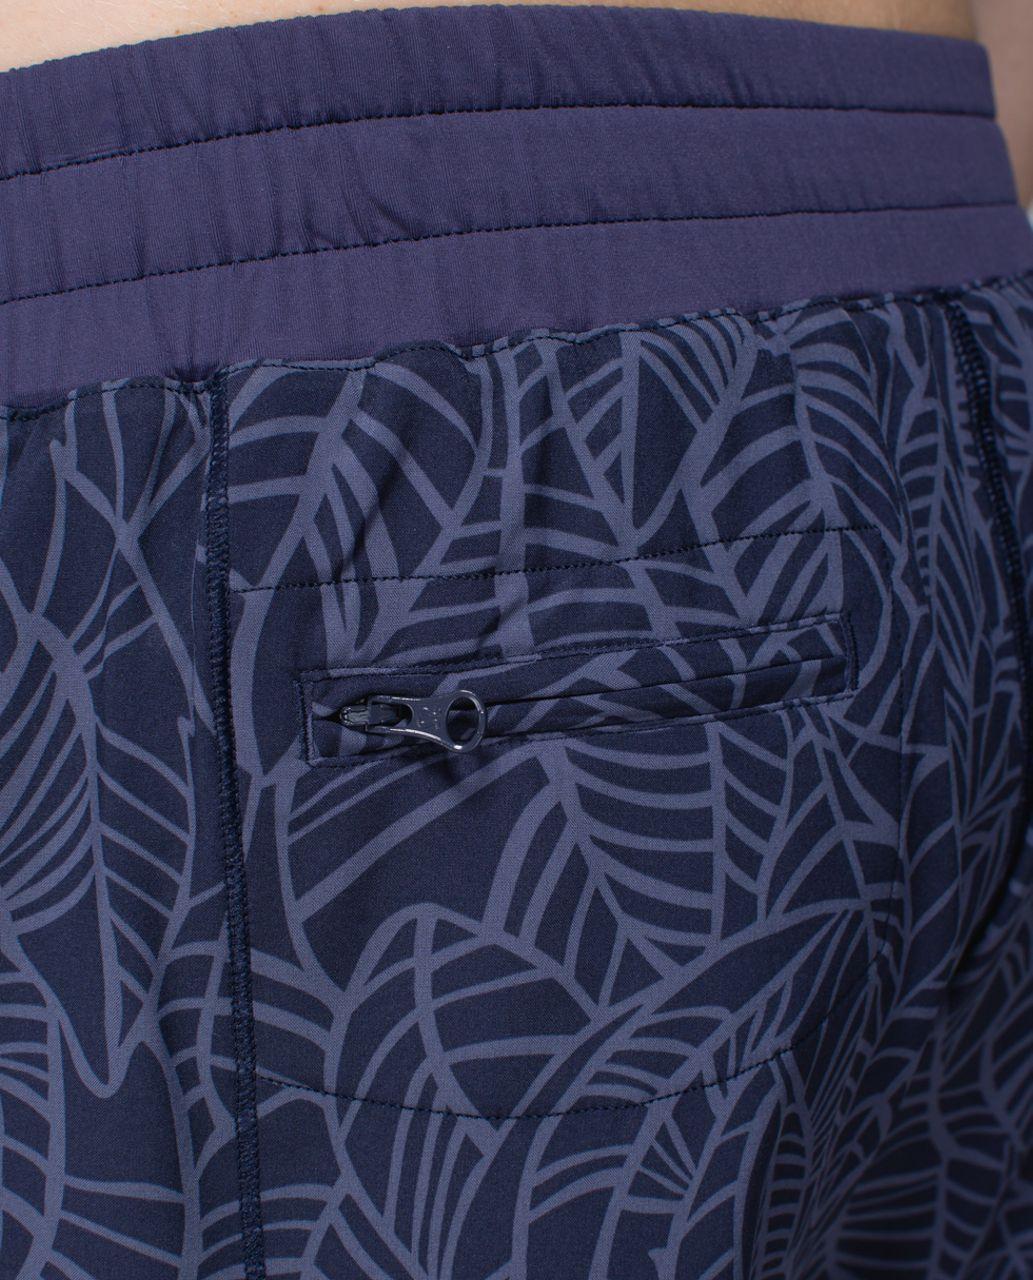 Lululemon Hotty Hot Short - Pretty Palm Cadet Greyvy / Cadet Blue